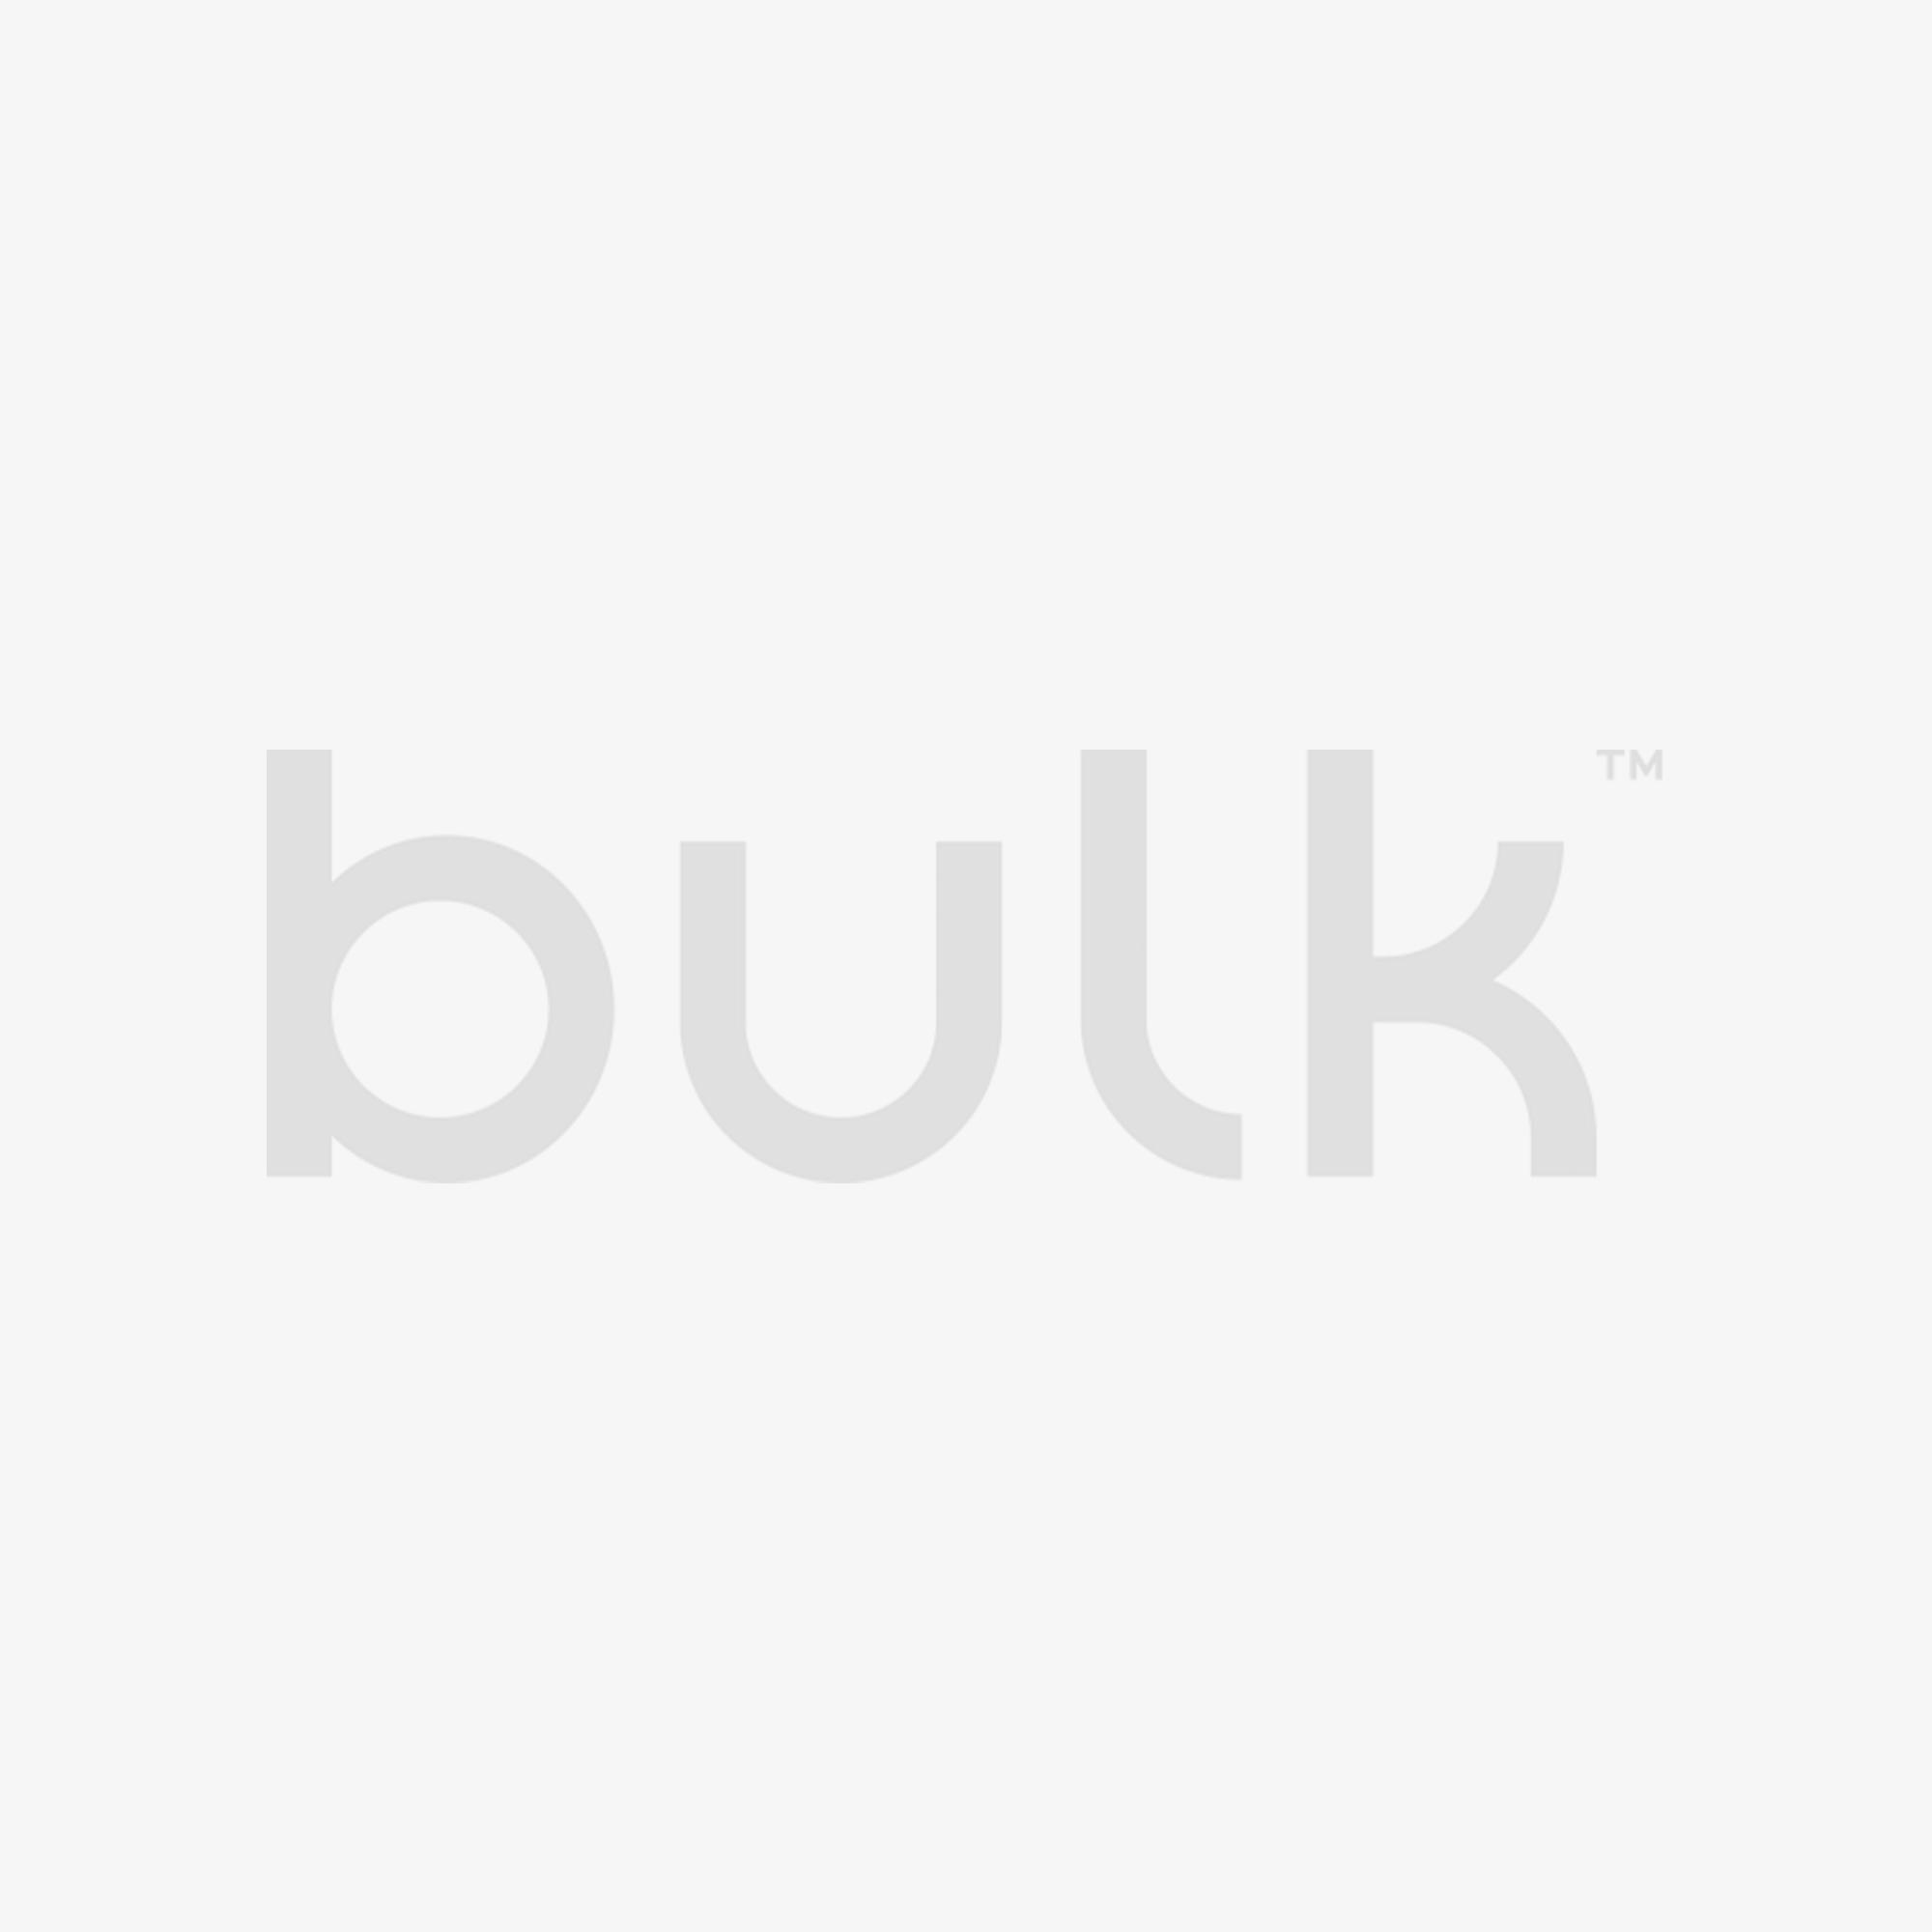 BULK POWDERS™ Lifting Straps